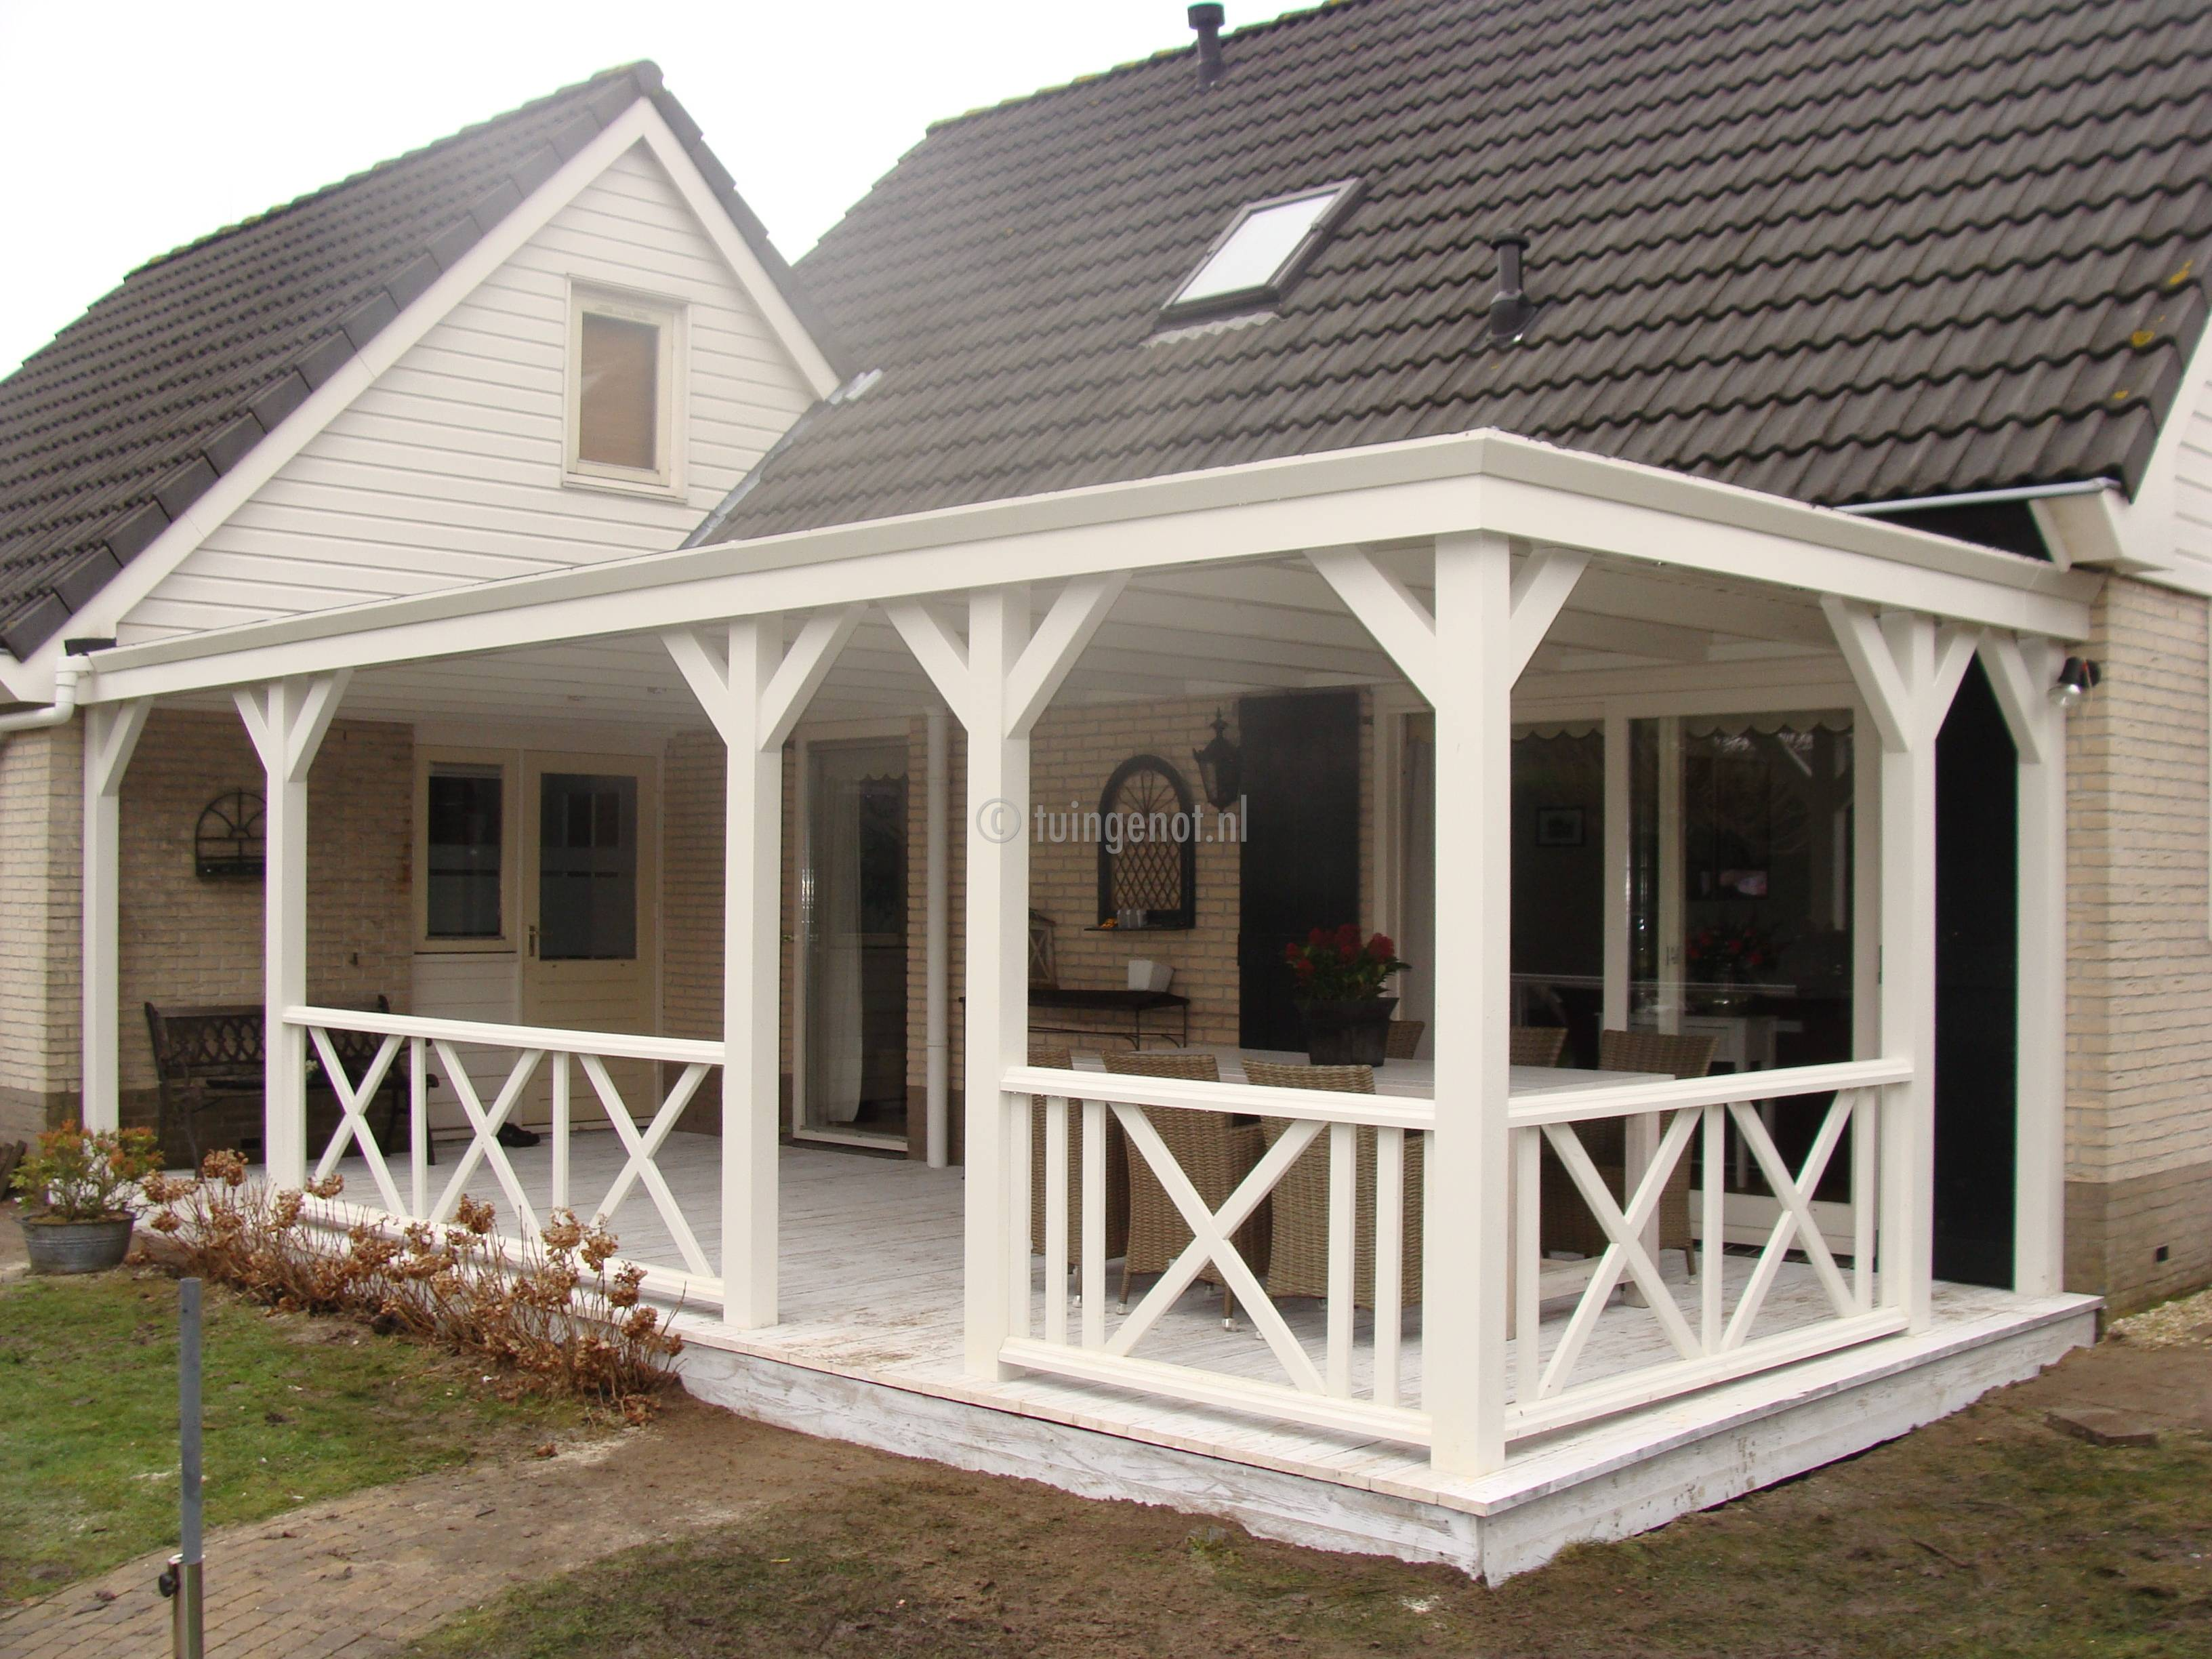 tuingenot lariks houten veranda overkapping met epdm. Black Bedroom Furniture Sets. Home Design Ideas